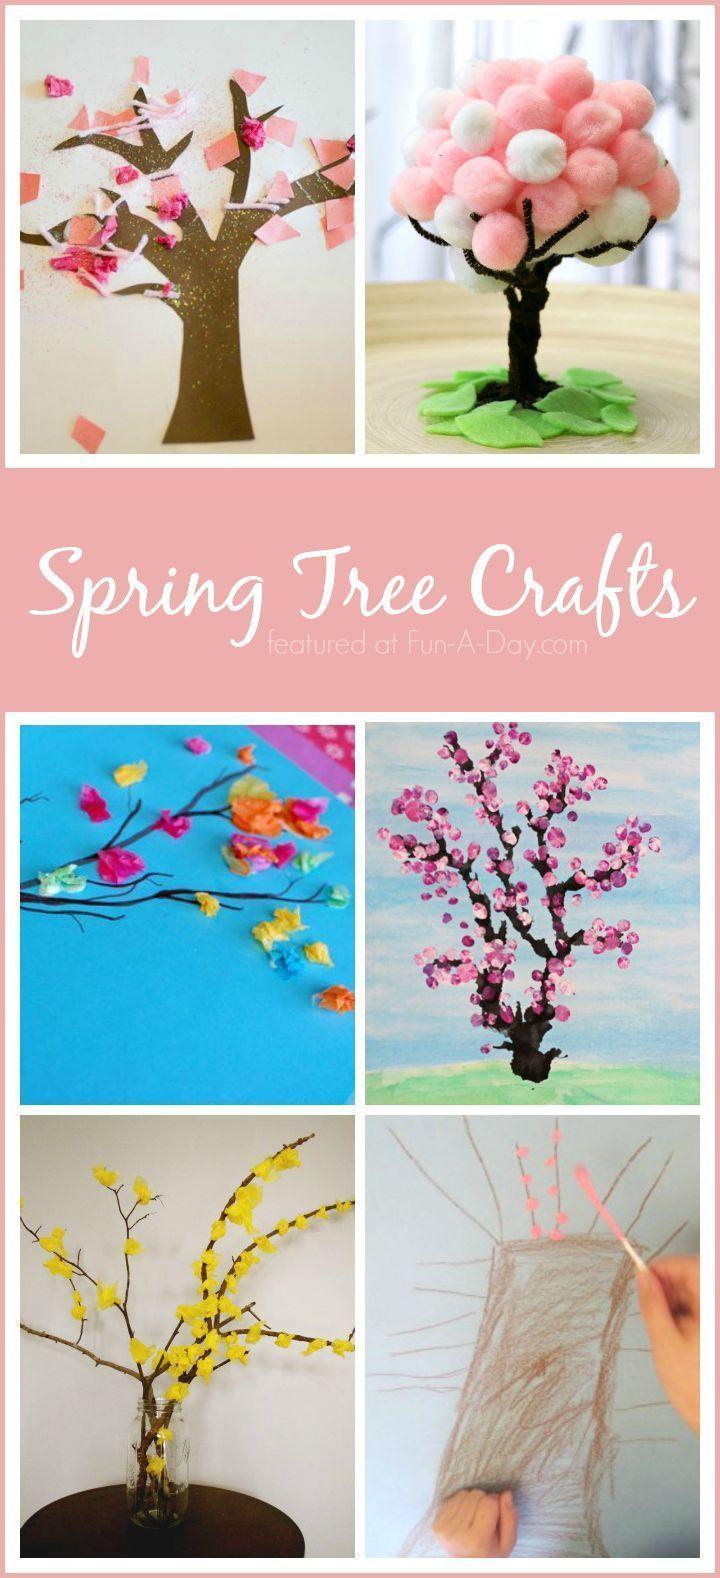 Spring Tree Crafts For Preschoolers To Make Fun A Day Spring Crafts Preschool Spring Crafts For Kids Spring Tree Art